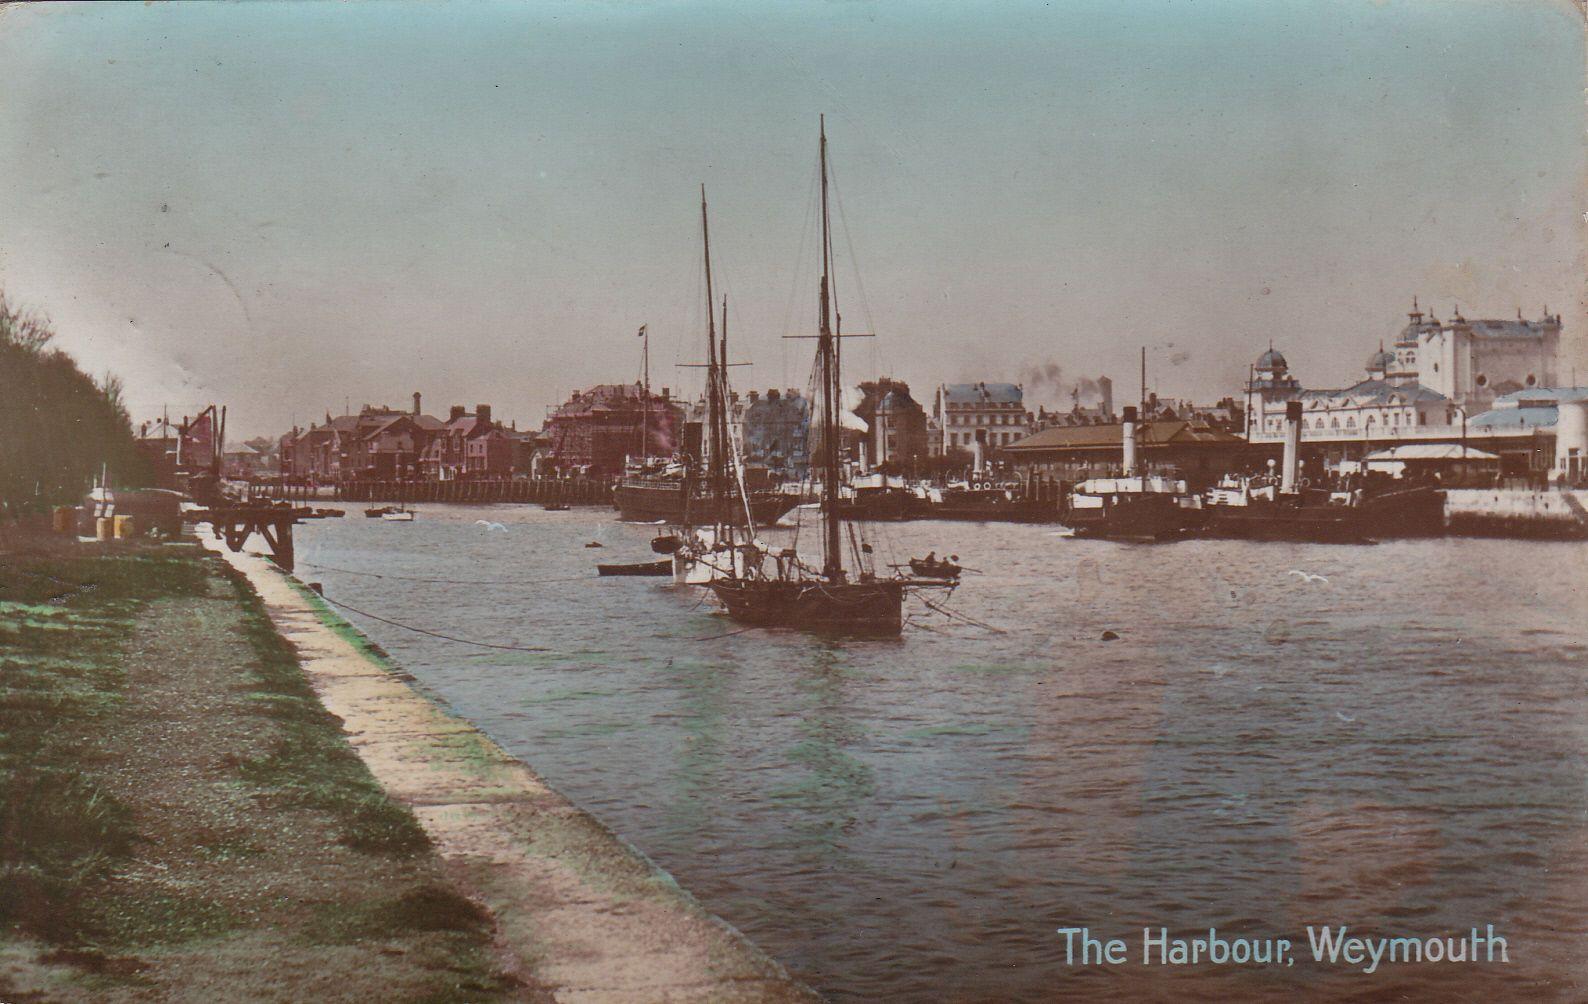 The Harbour, Weymouth, Dorset : Postcard (1913) • EUR 4,73 ...